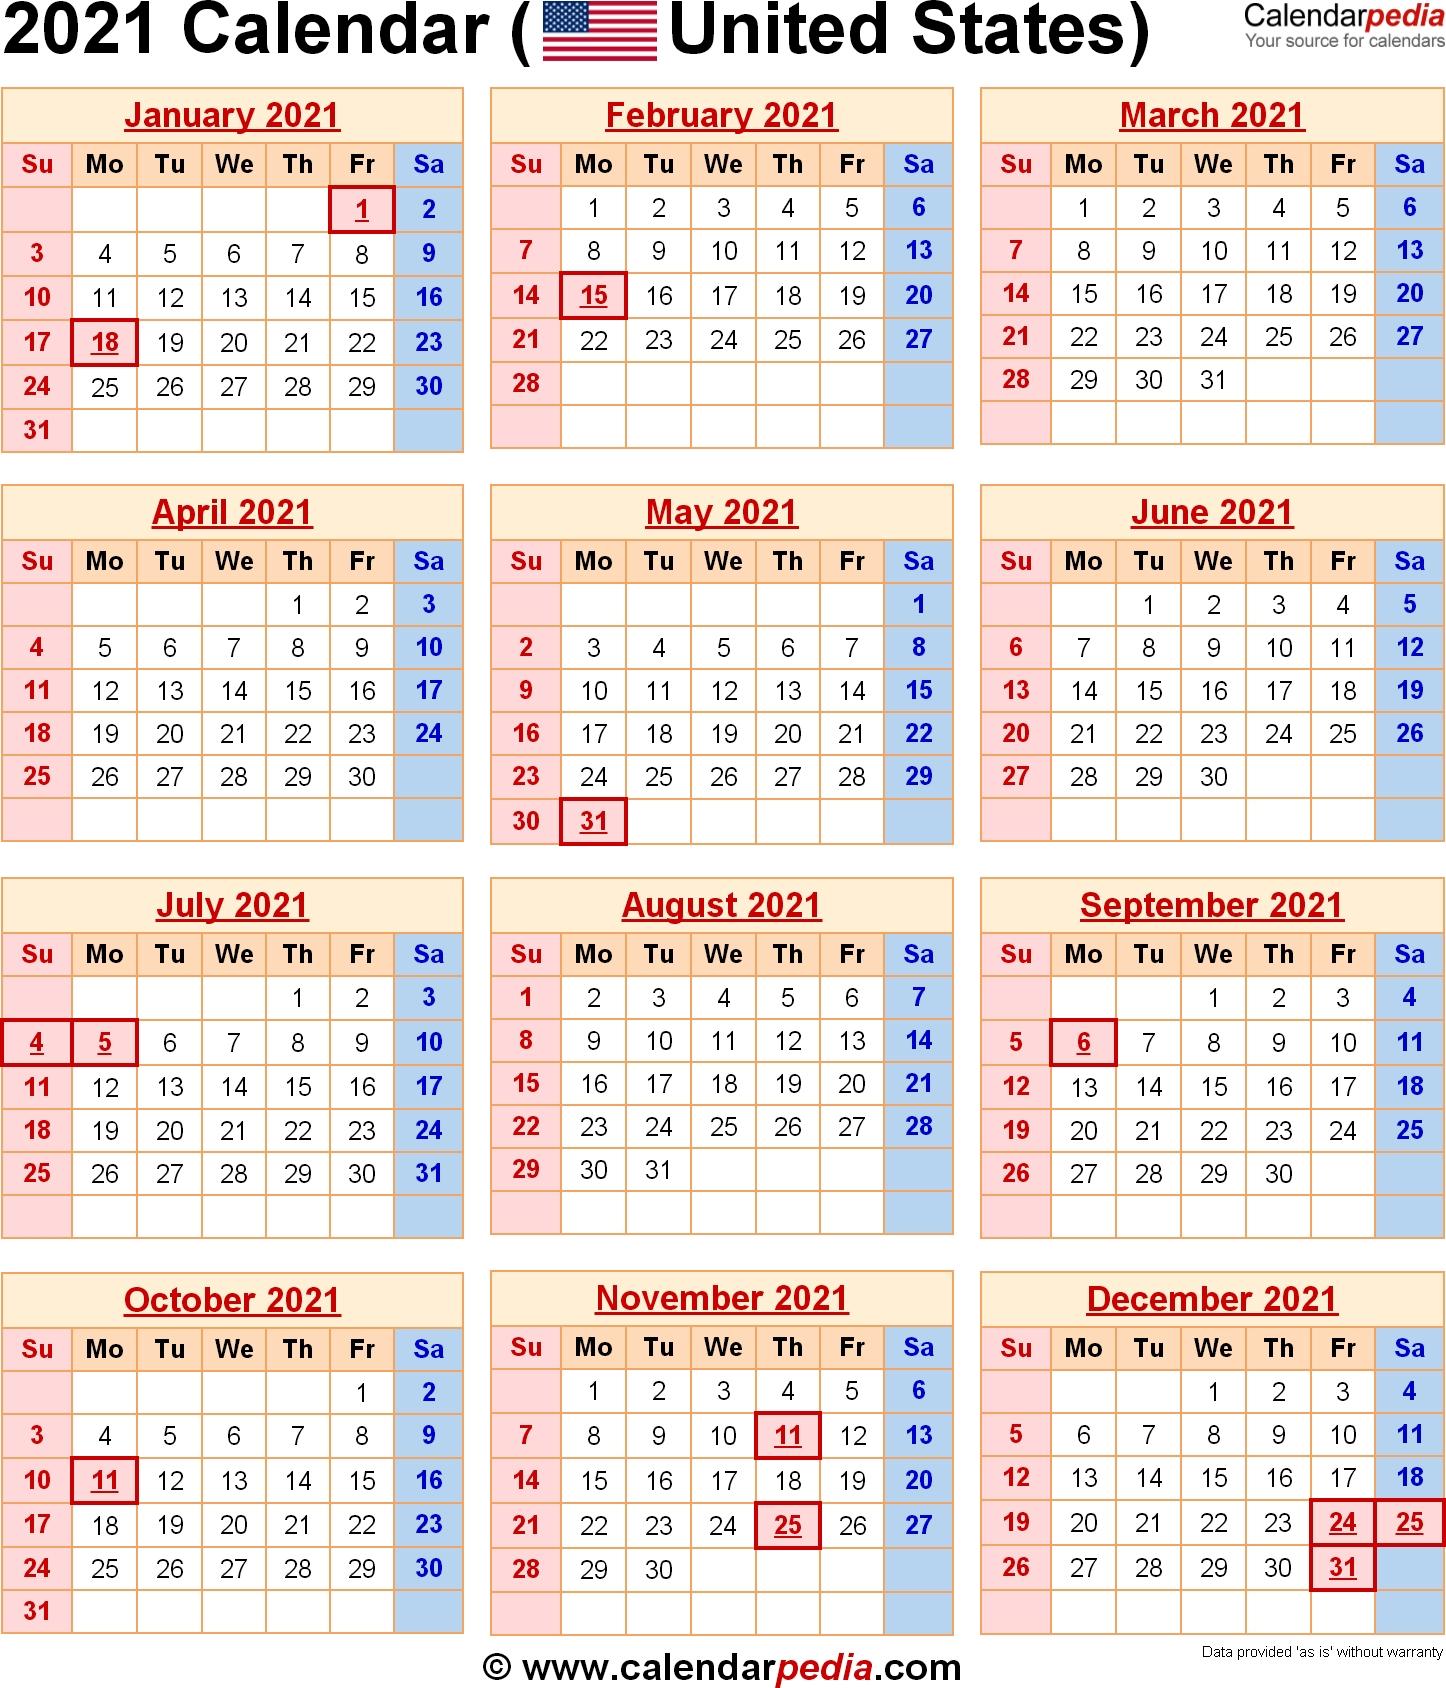 2021 Calendar With Federal Holidays-Bank Holidays Calendar 2021